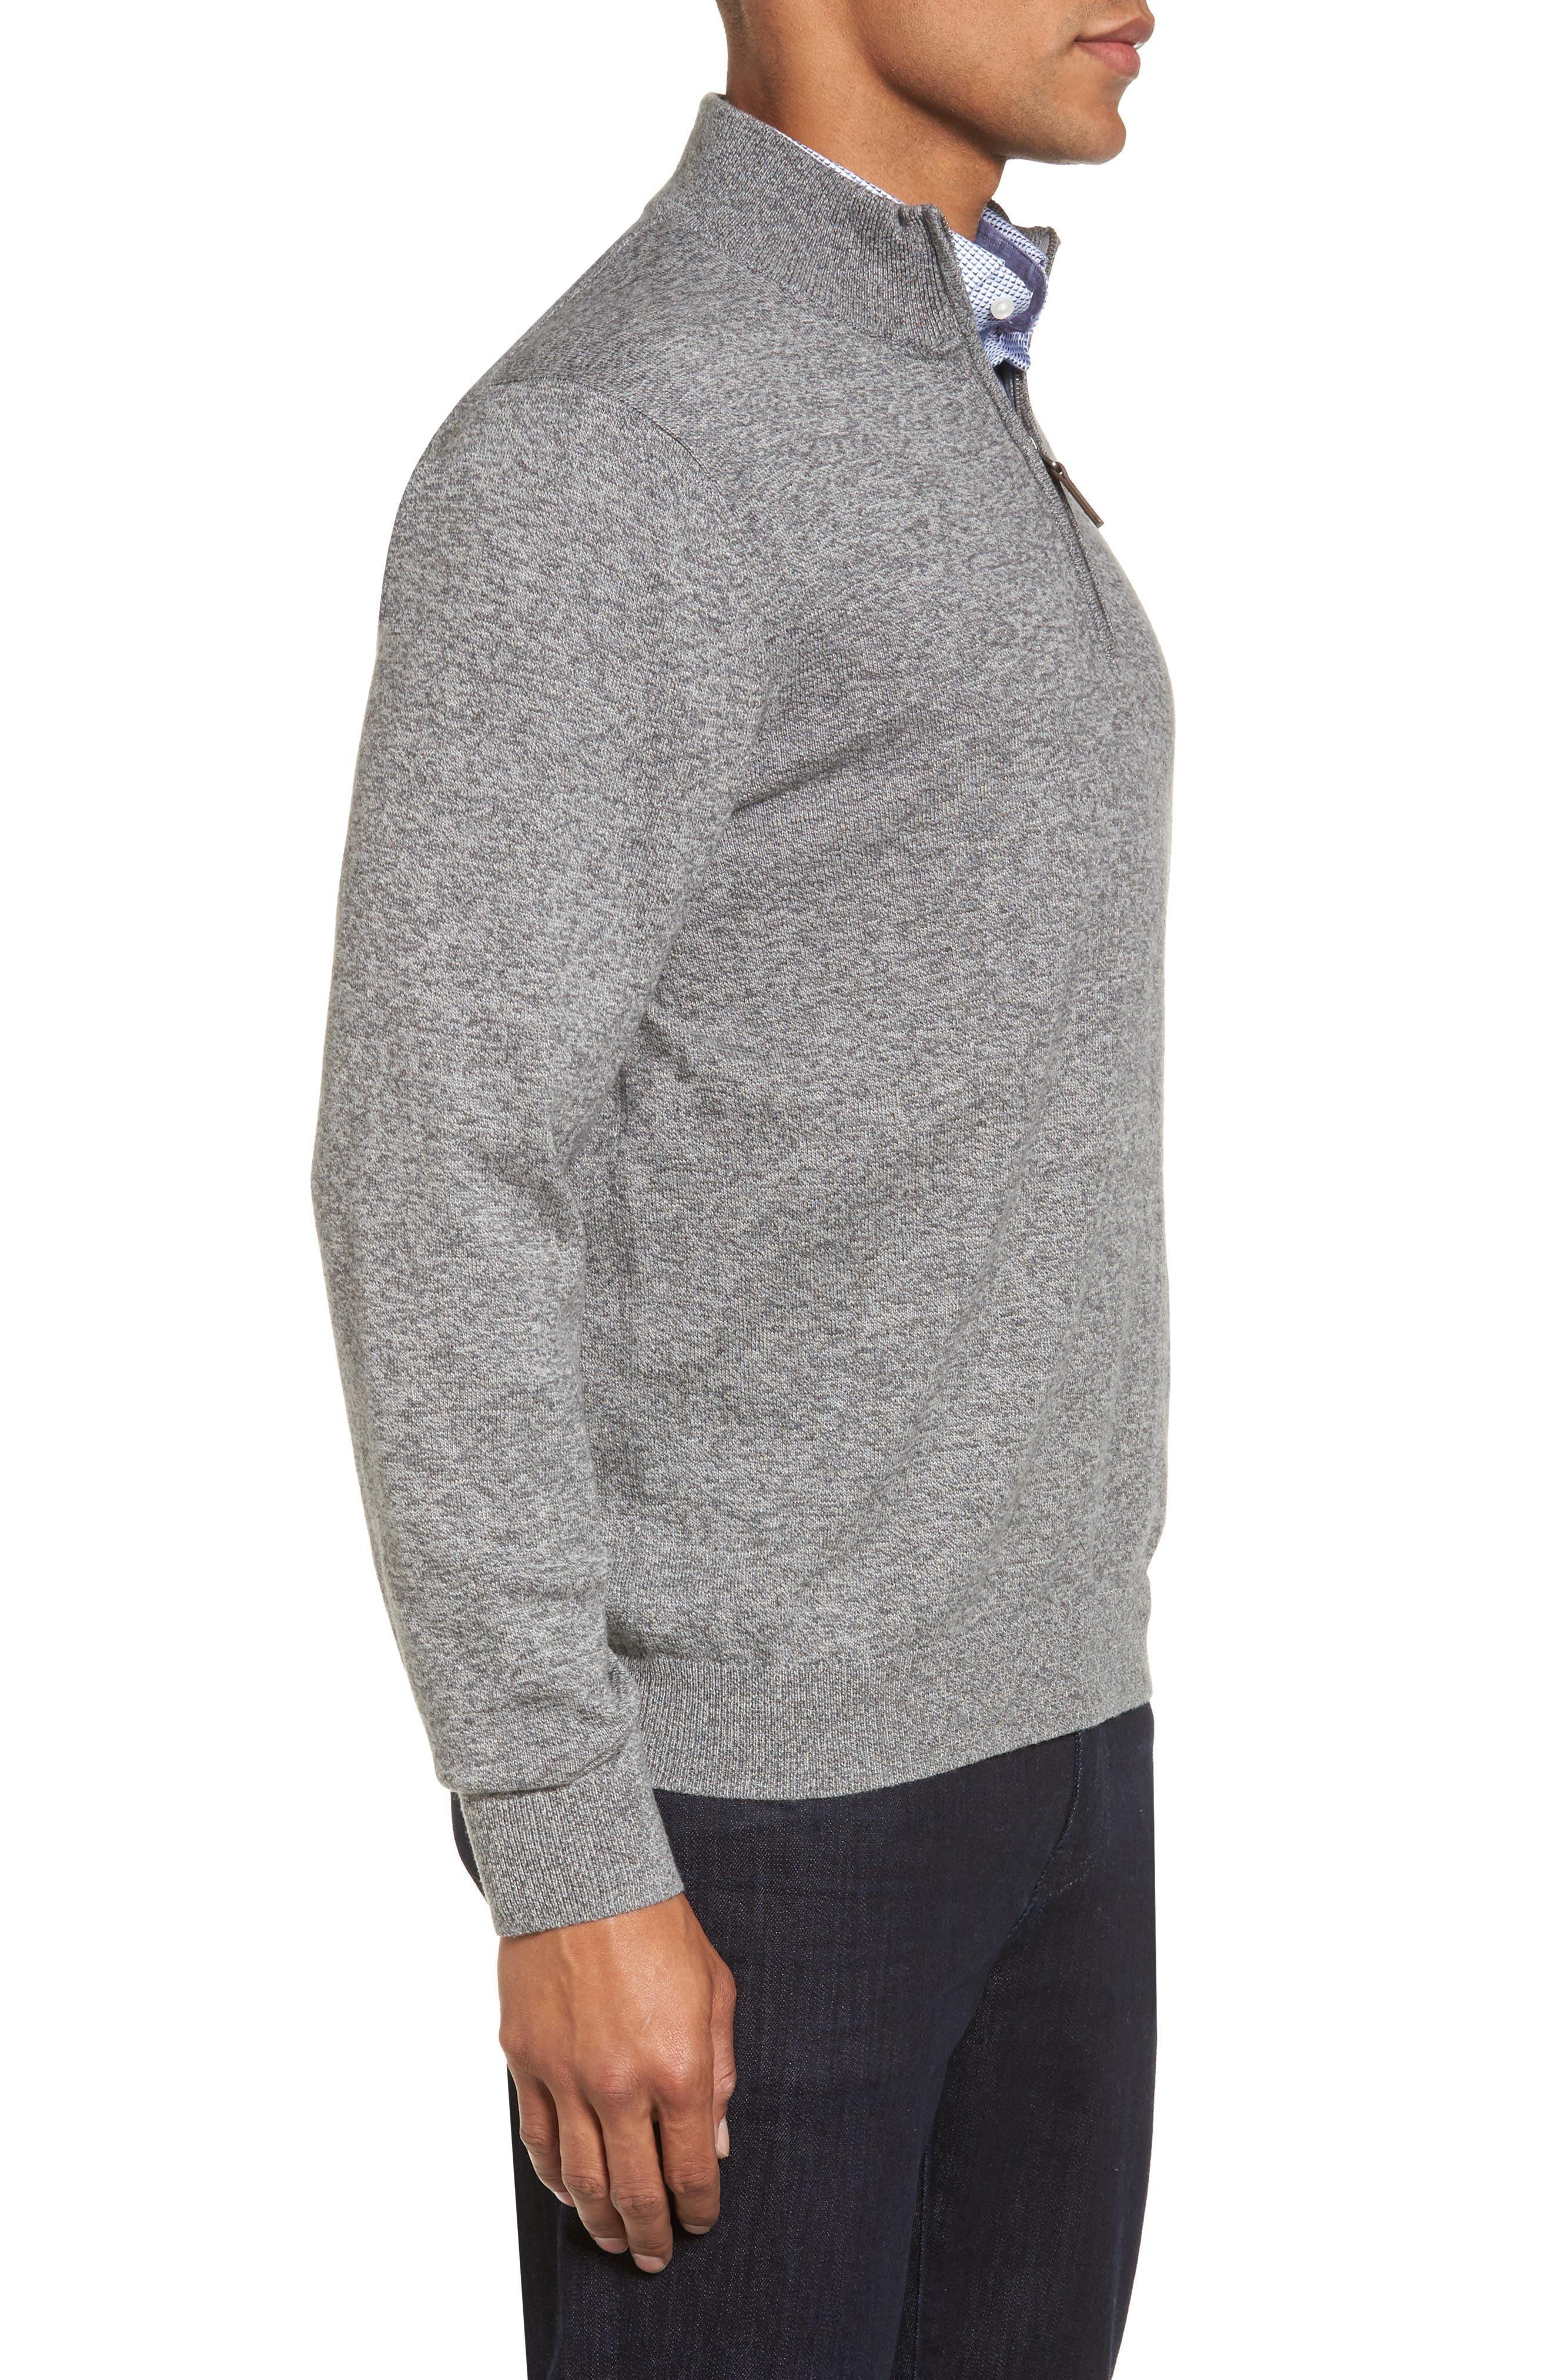 Alternate Image 3  - Nordstrom Men's Shop Quarter Zip Sweater (Big)